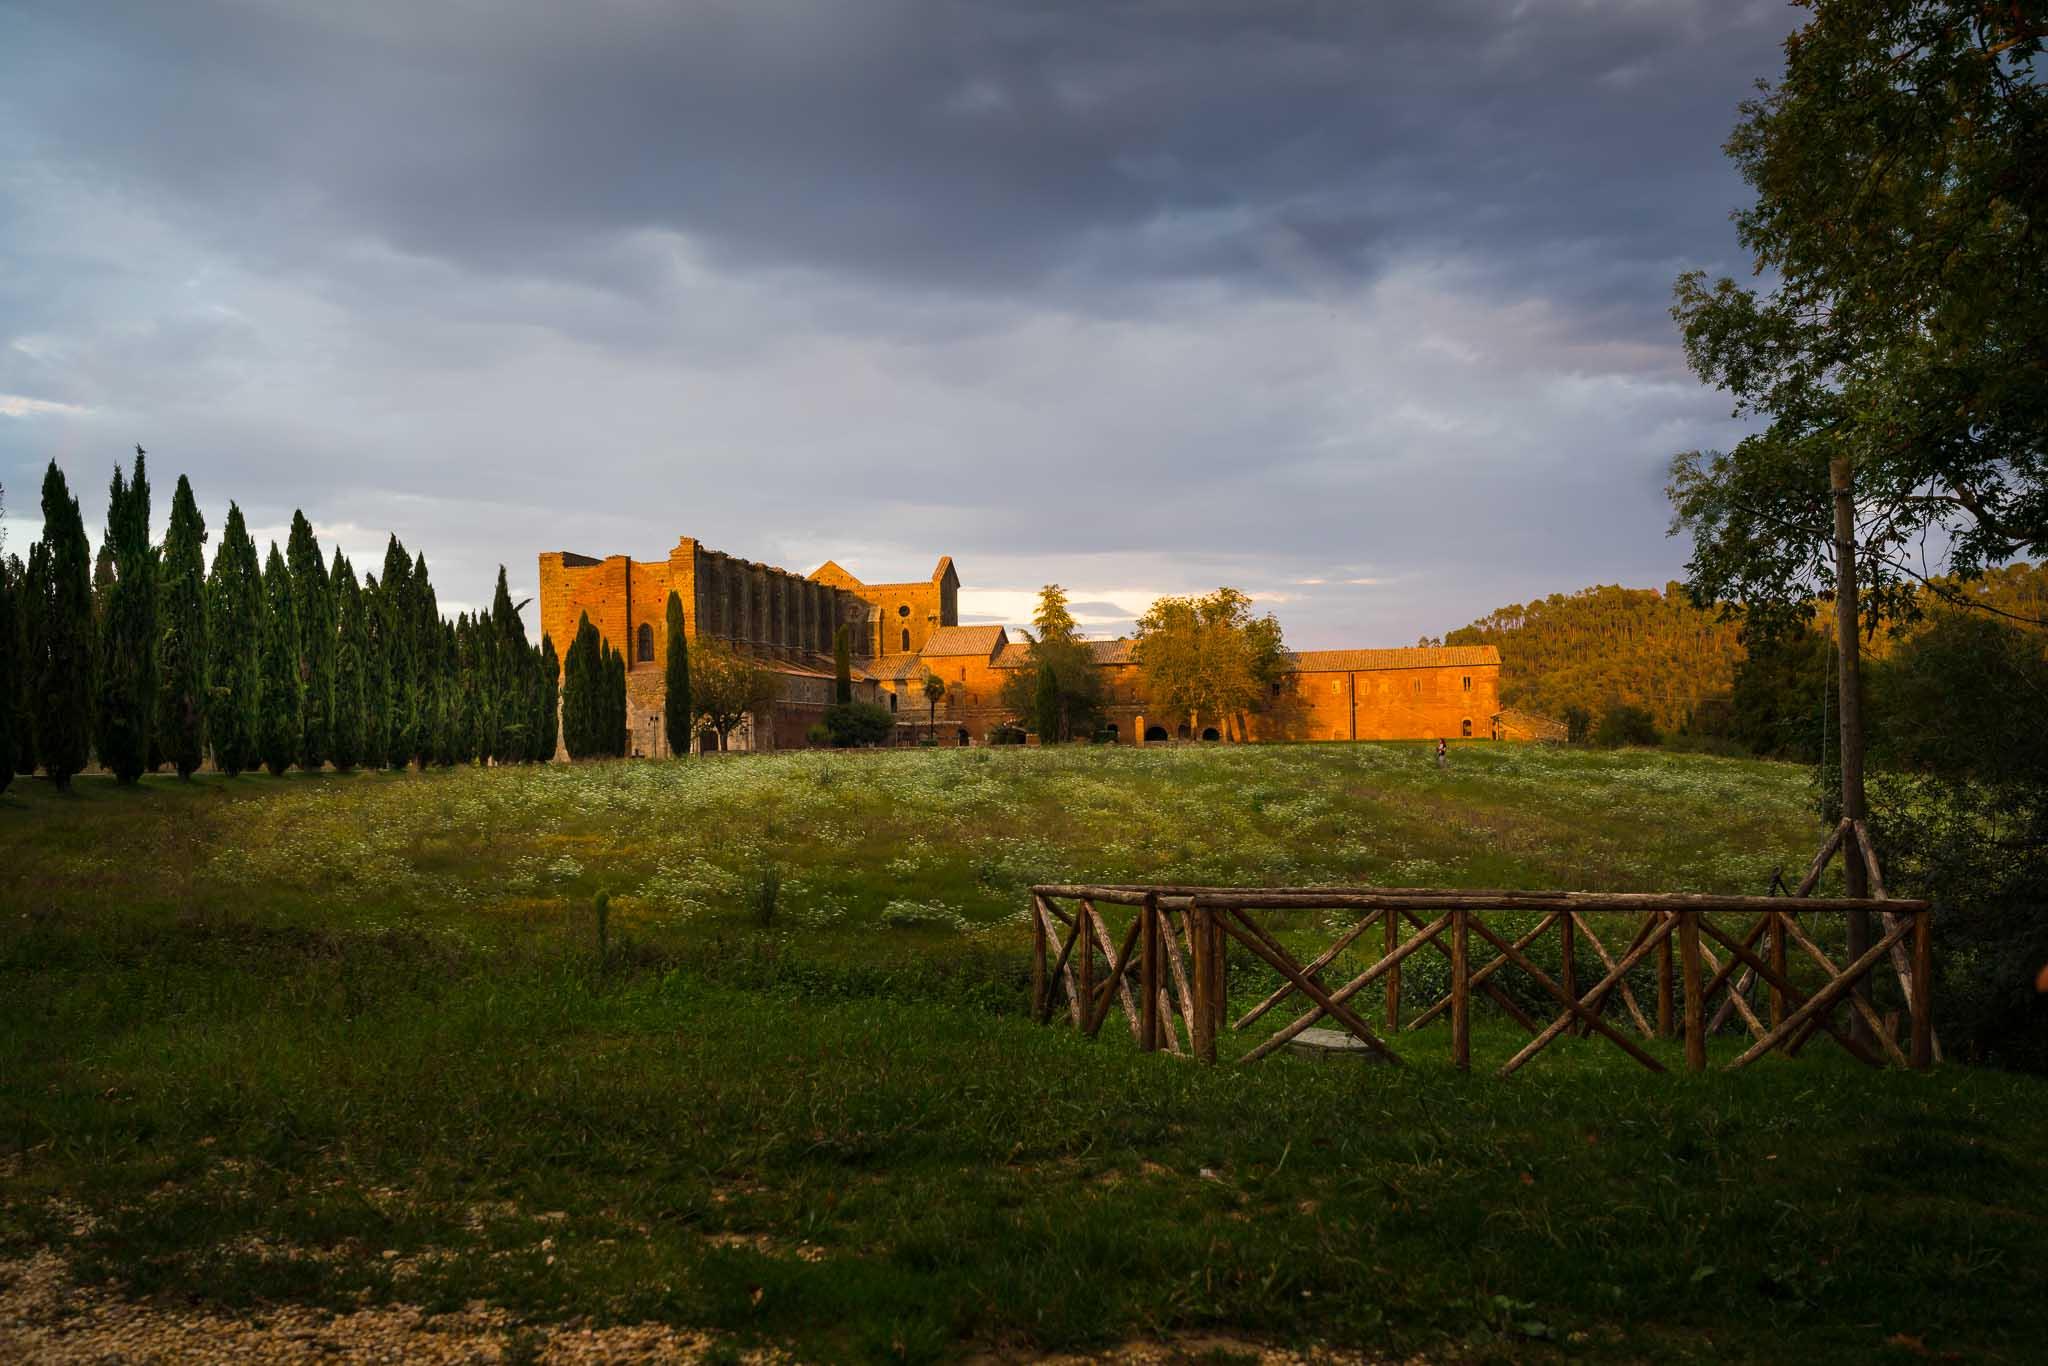 The beautiful Abbey of San Galgano